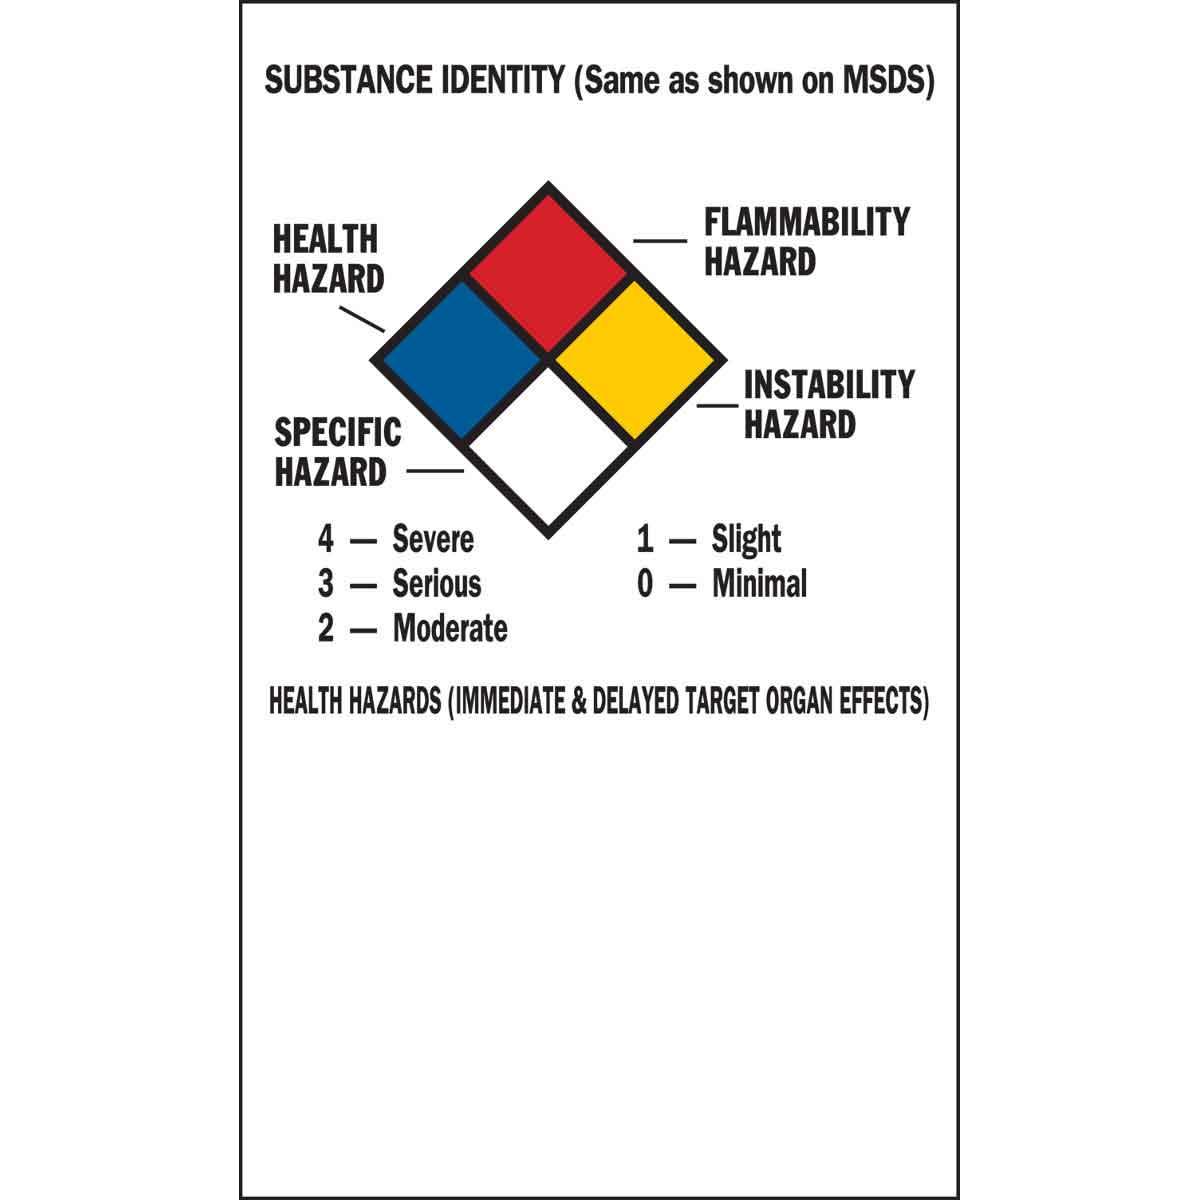 Brady® 121163 Non-Reflective Rectangular Self-Adhesive Write-On Laboratory Label, 1-1/4 in W, HEALTH HAZARD FLAMMABILITY HAZARD INSTABILITY HAZARD PERSONAL PROTECTION Legend, Black/Blue/Red/Yellow on White, B-7569 Adhesive Vinyl Film, 500 per Roll Labels